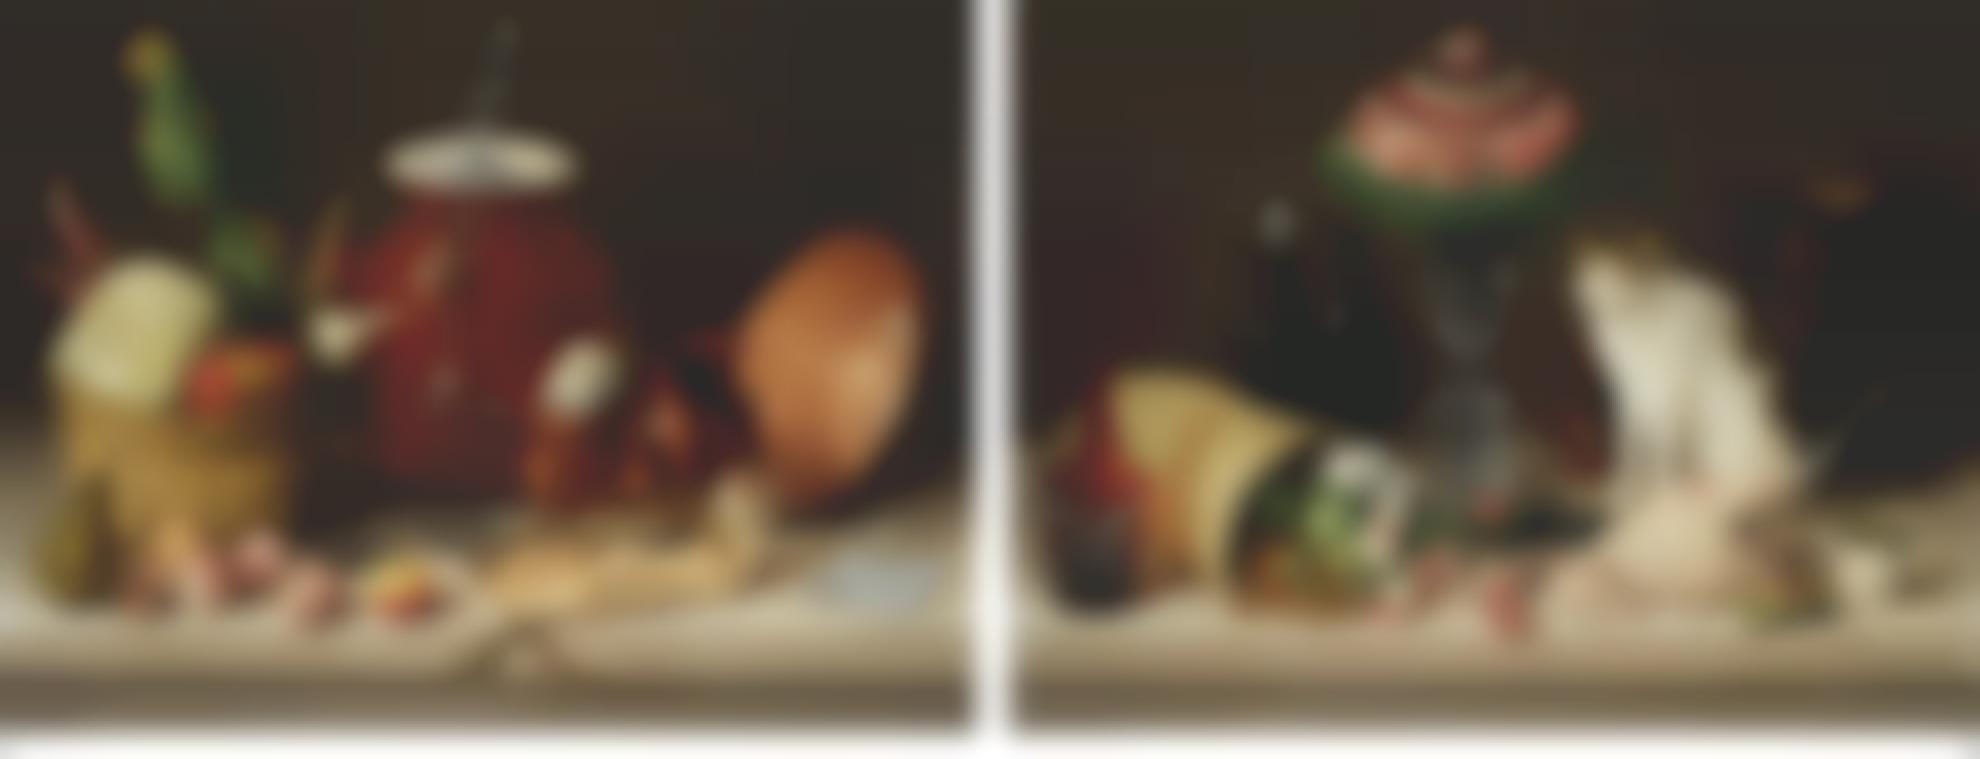 Jose Agustin Arrieta-Two Still Lifes: (I) Bodegon (Canasta, Perico, Cazo Y Gallina Acostada) and (II) Bodegon (Gato, Florero, Licorera, Pollo Muerto Y Taza De Aceitunas)-